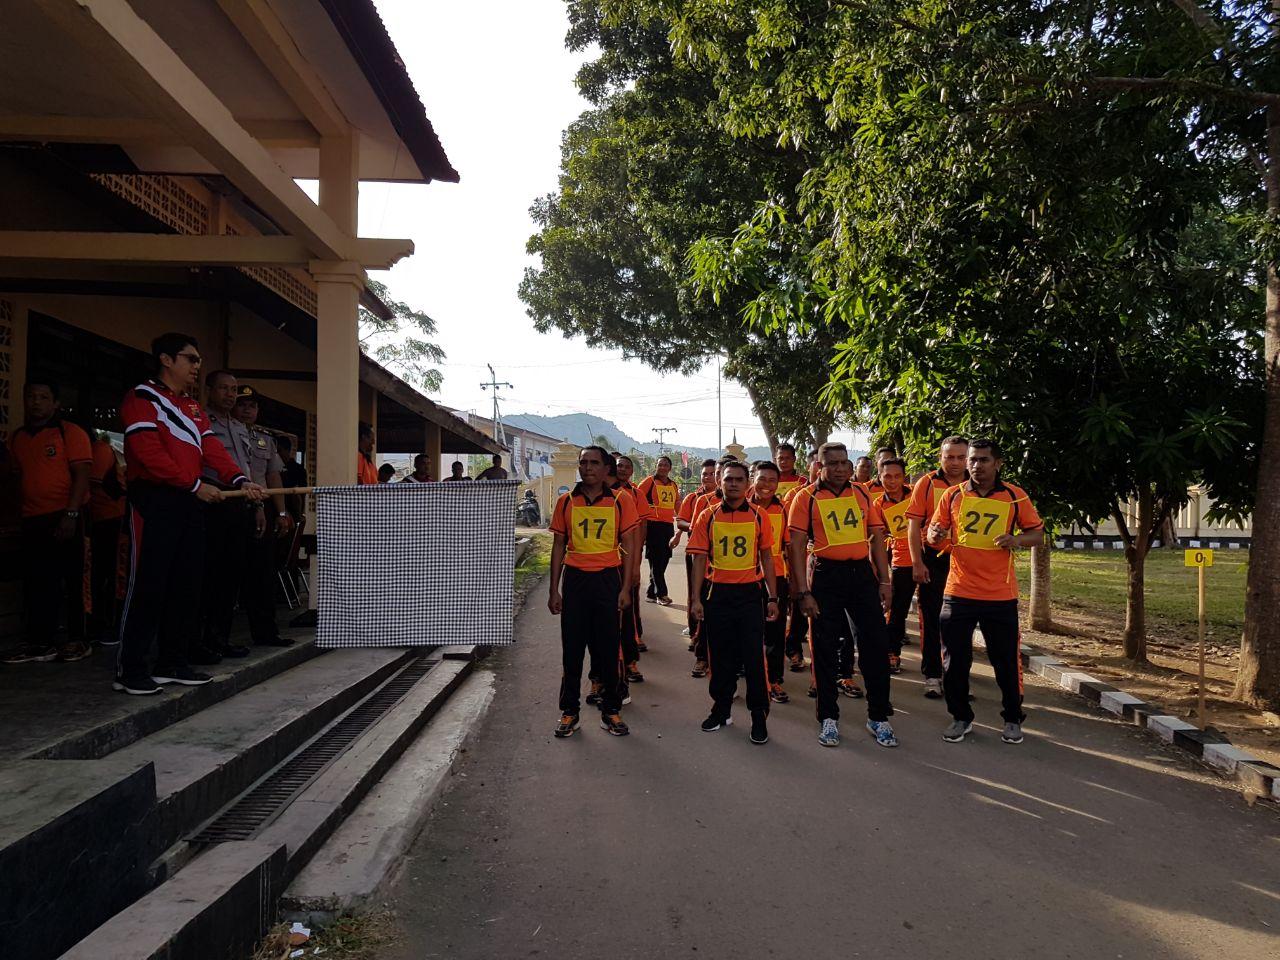 Meningkatkan Kebugaran Fisik Serta Performa, Anggota Polres Mabar Laksanakan Kesemaptaan Jasmani